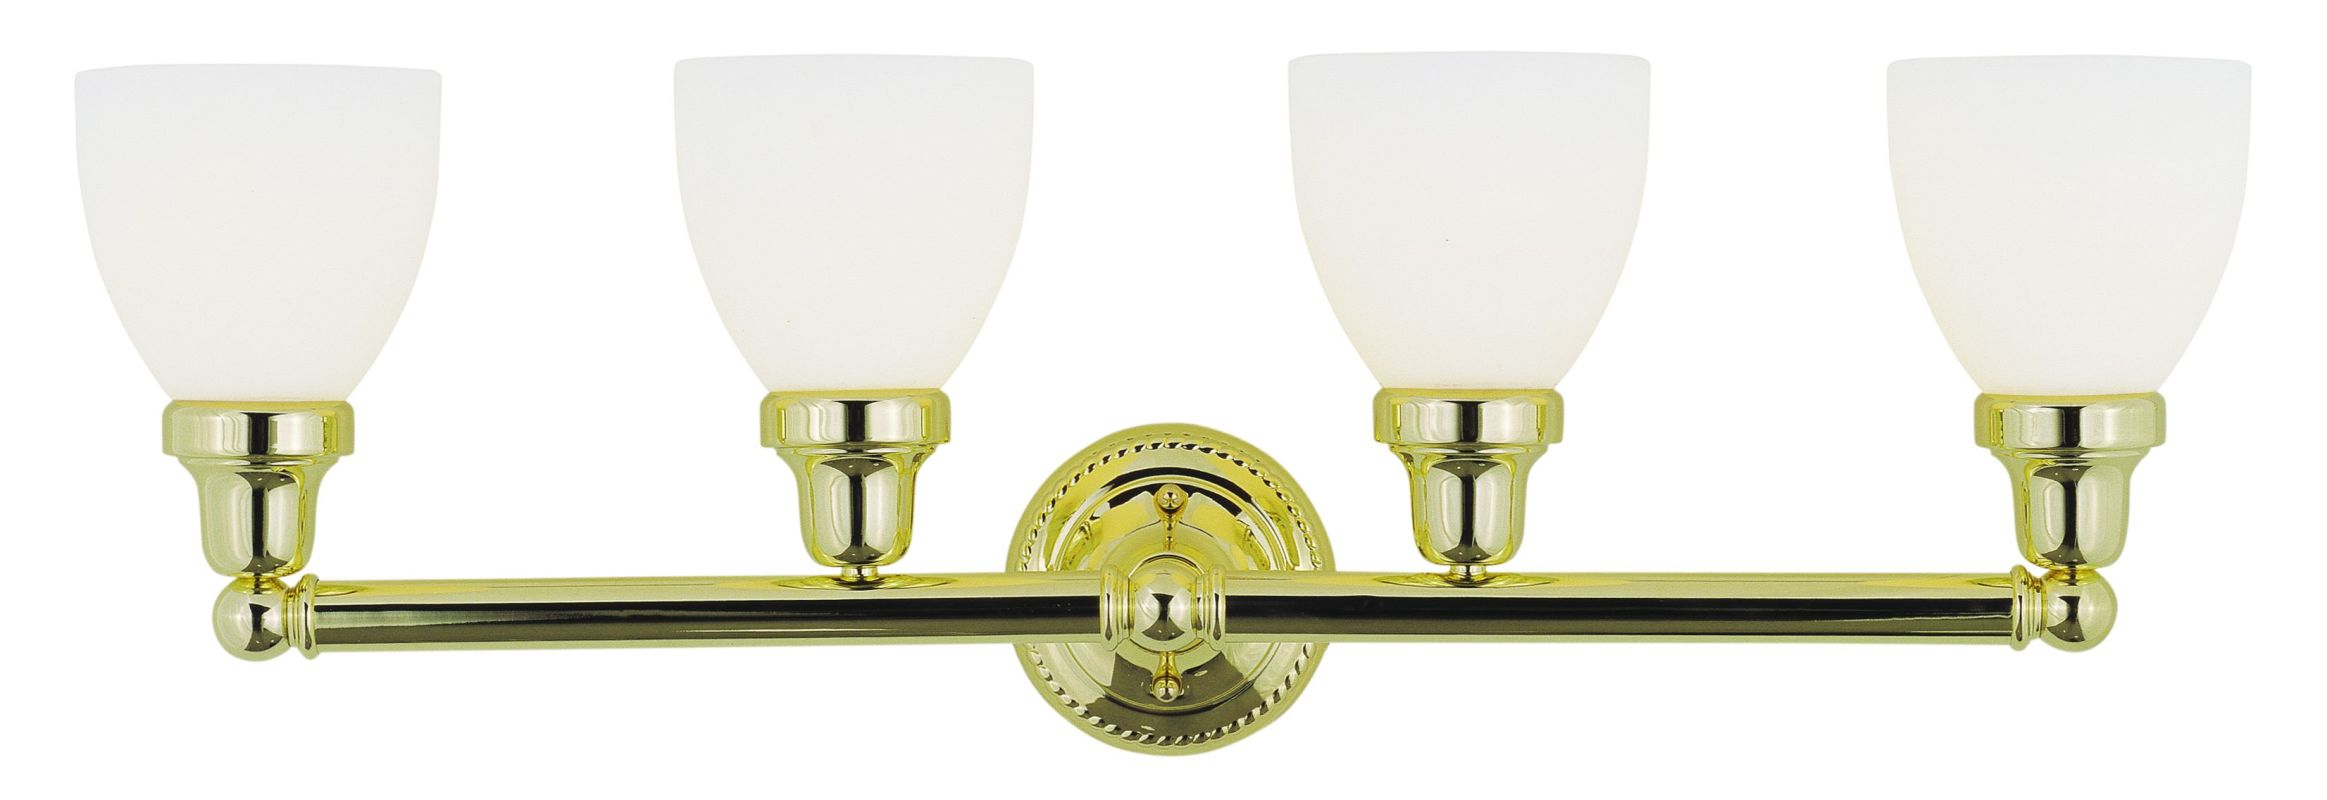 Livex Lighting 1024-02 Polished Brass Classic 4 Light